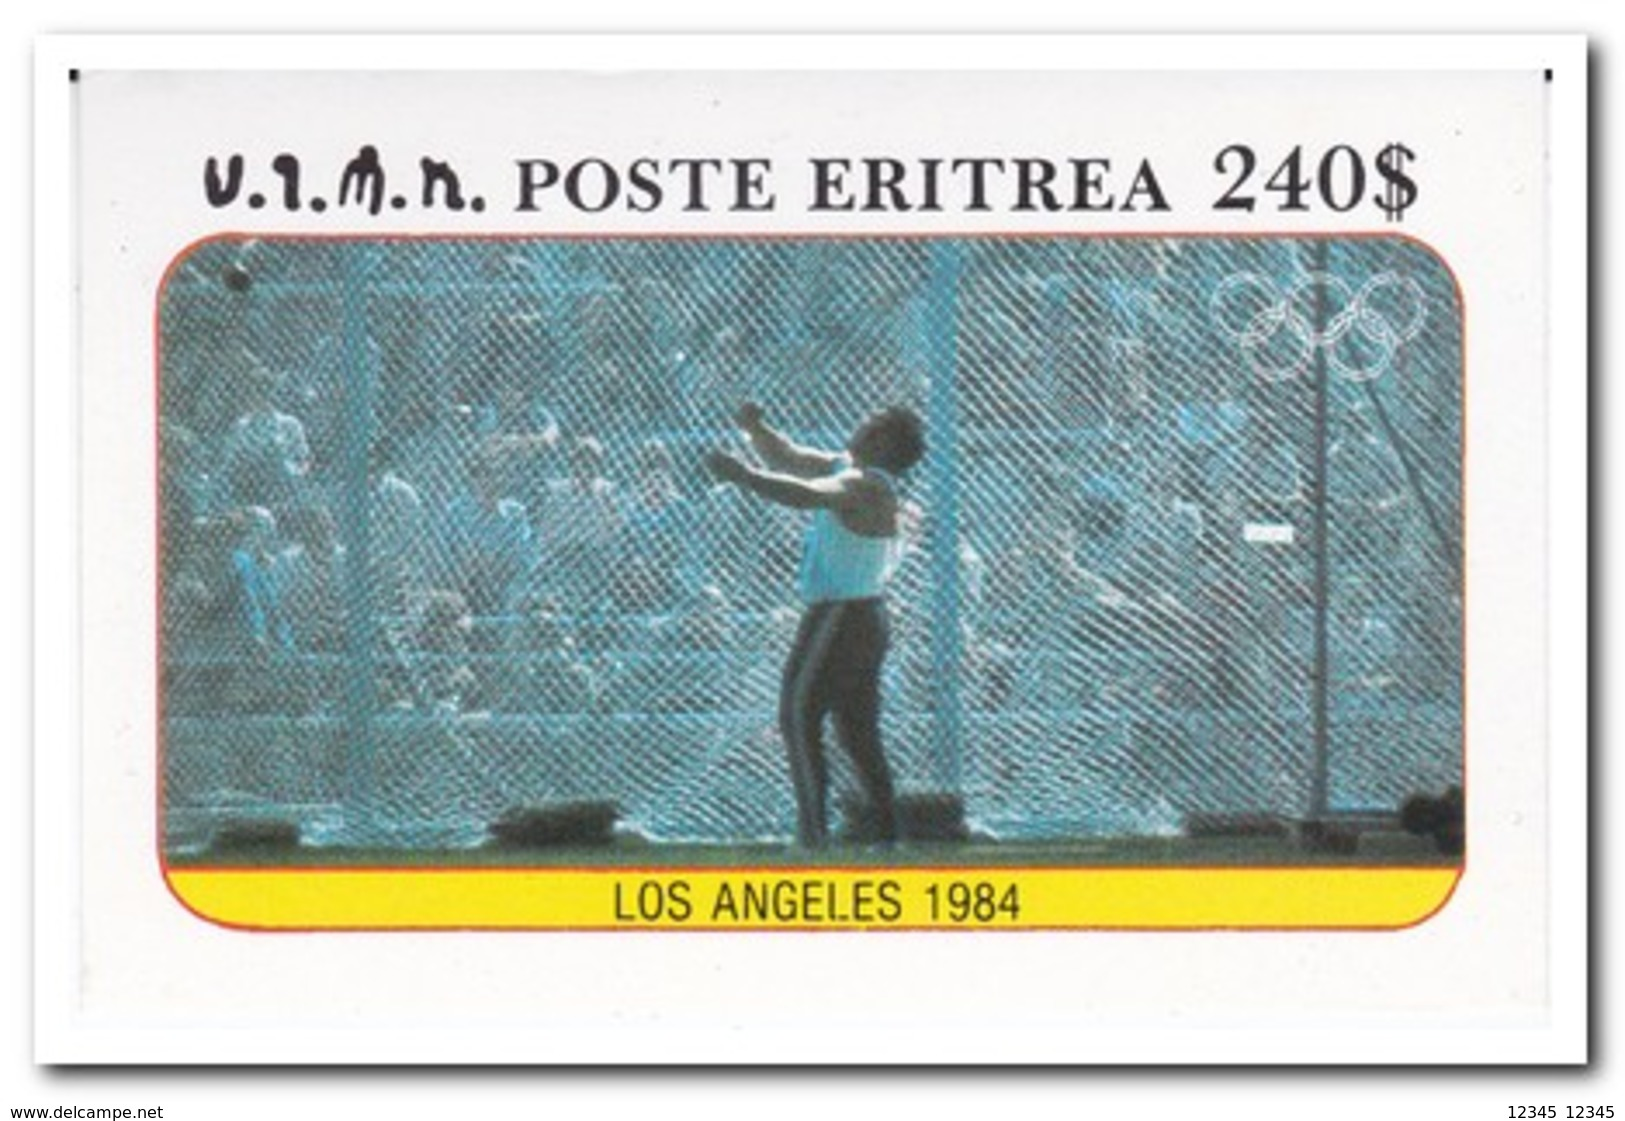 Eritrea 1984, Postfris MNH, Olympic Games - Eritrea